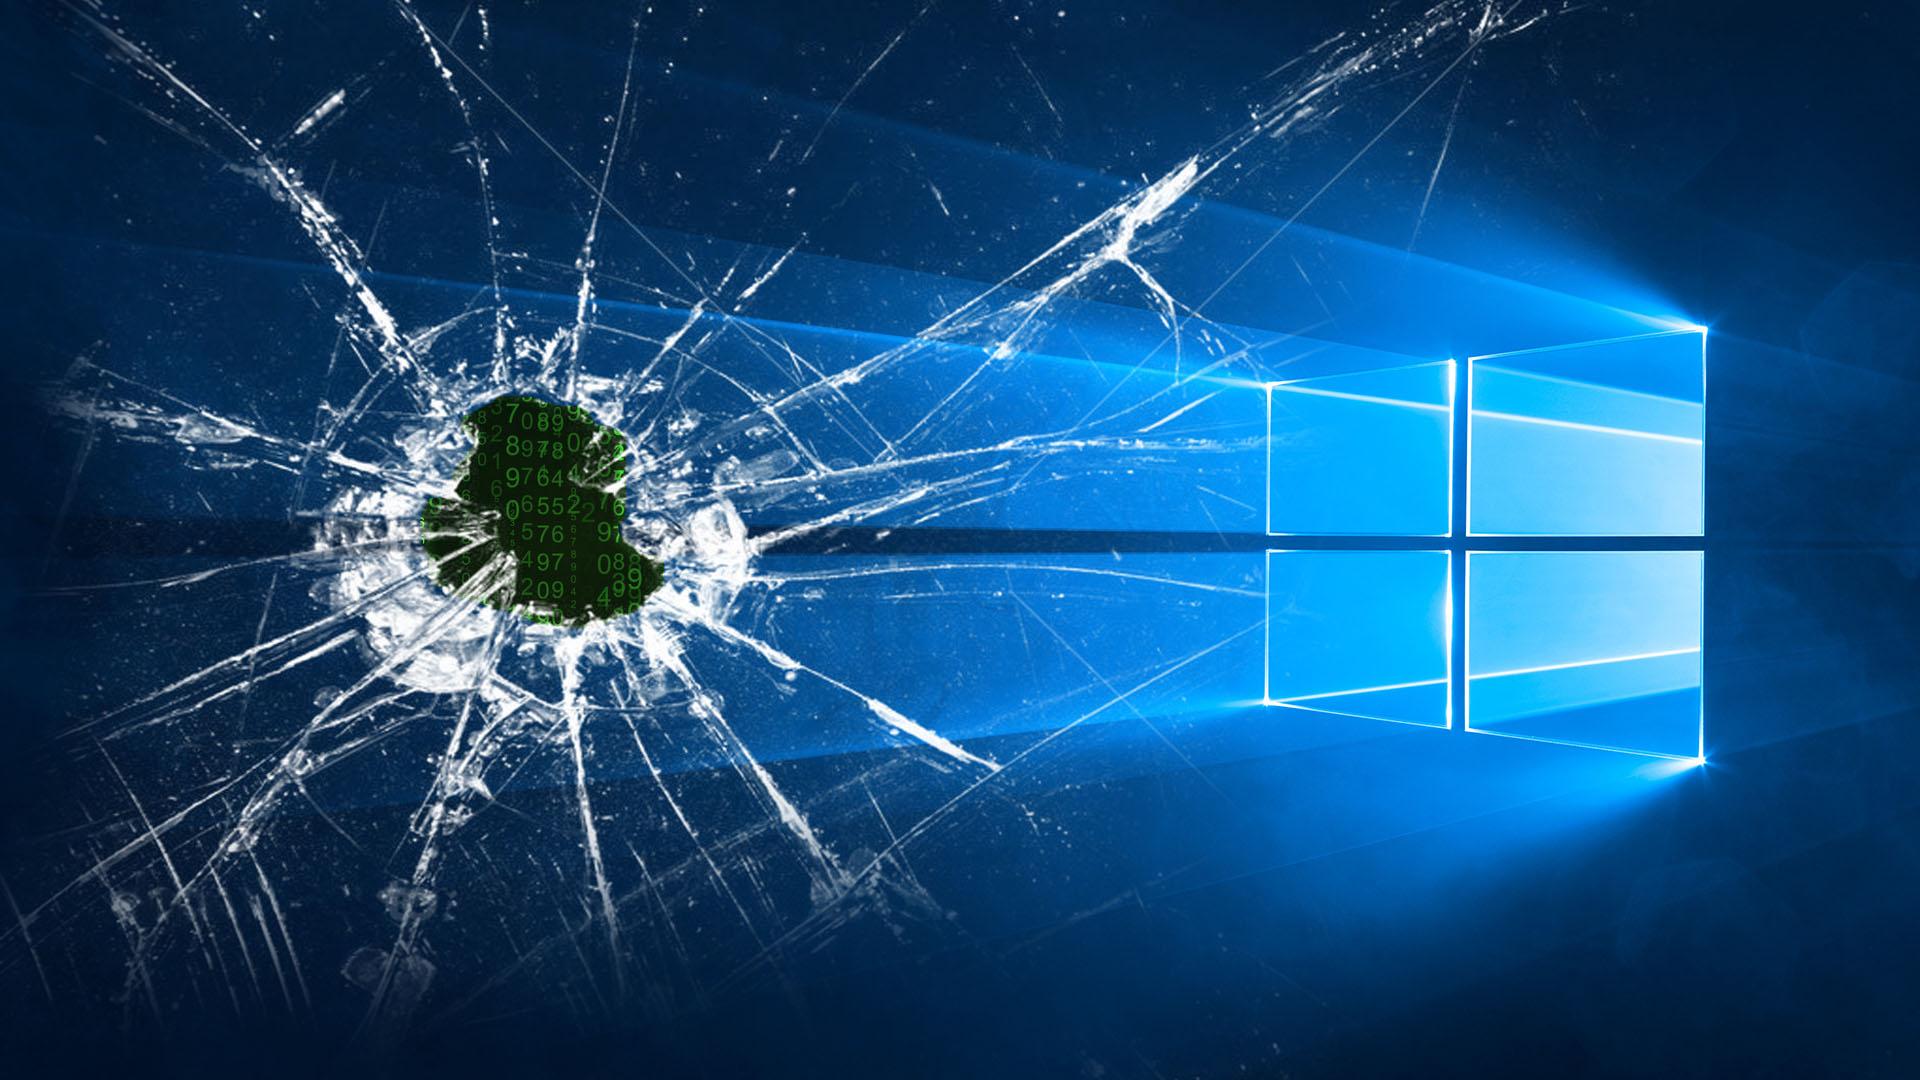 Download Crack Windows 10